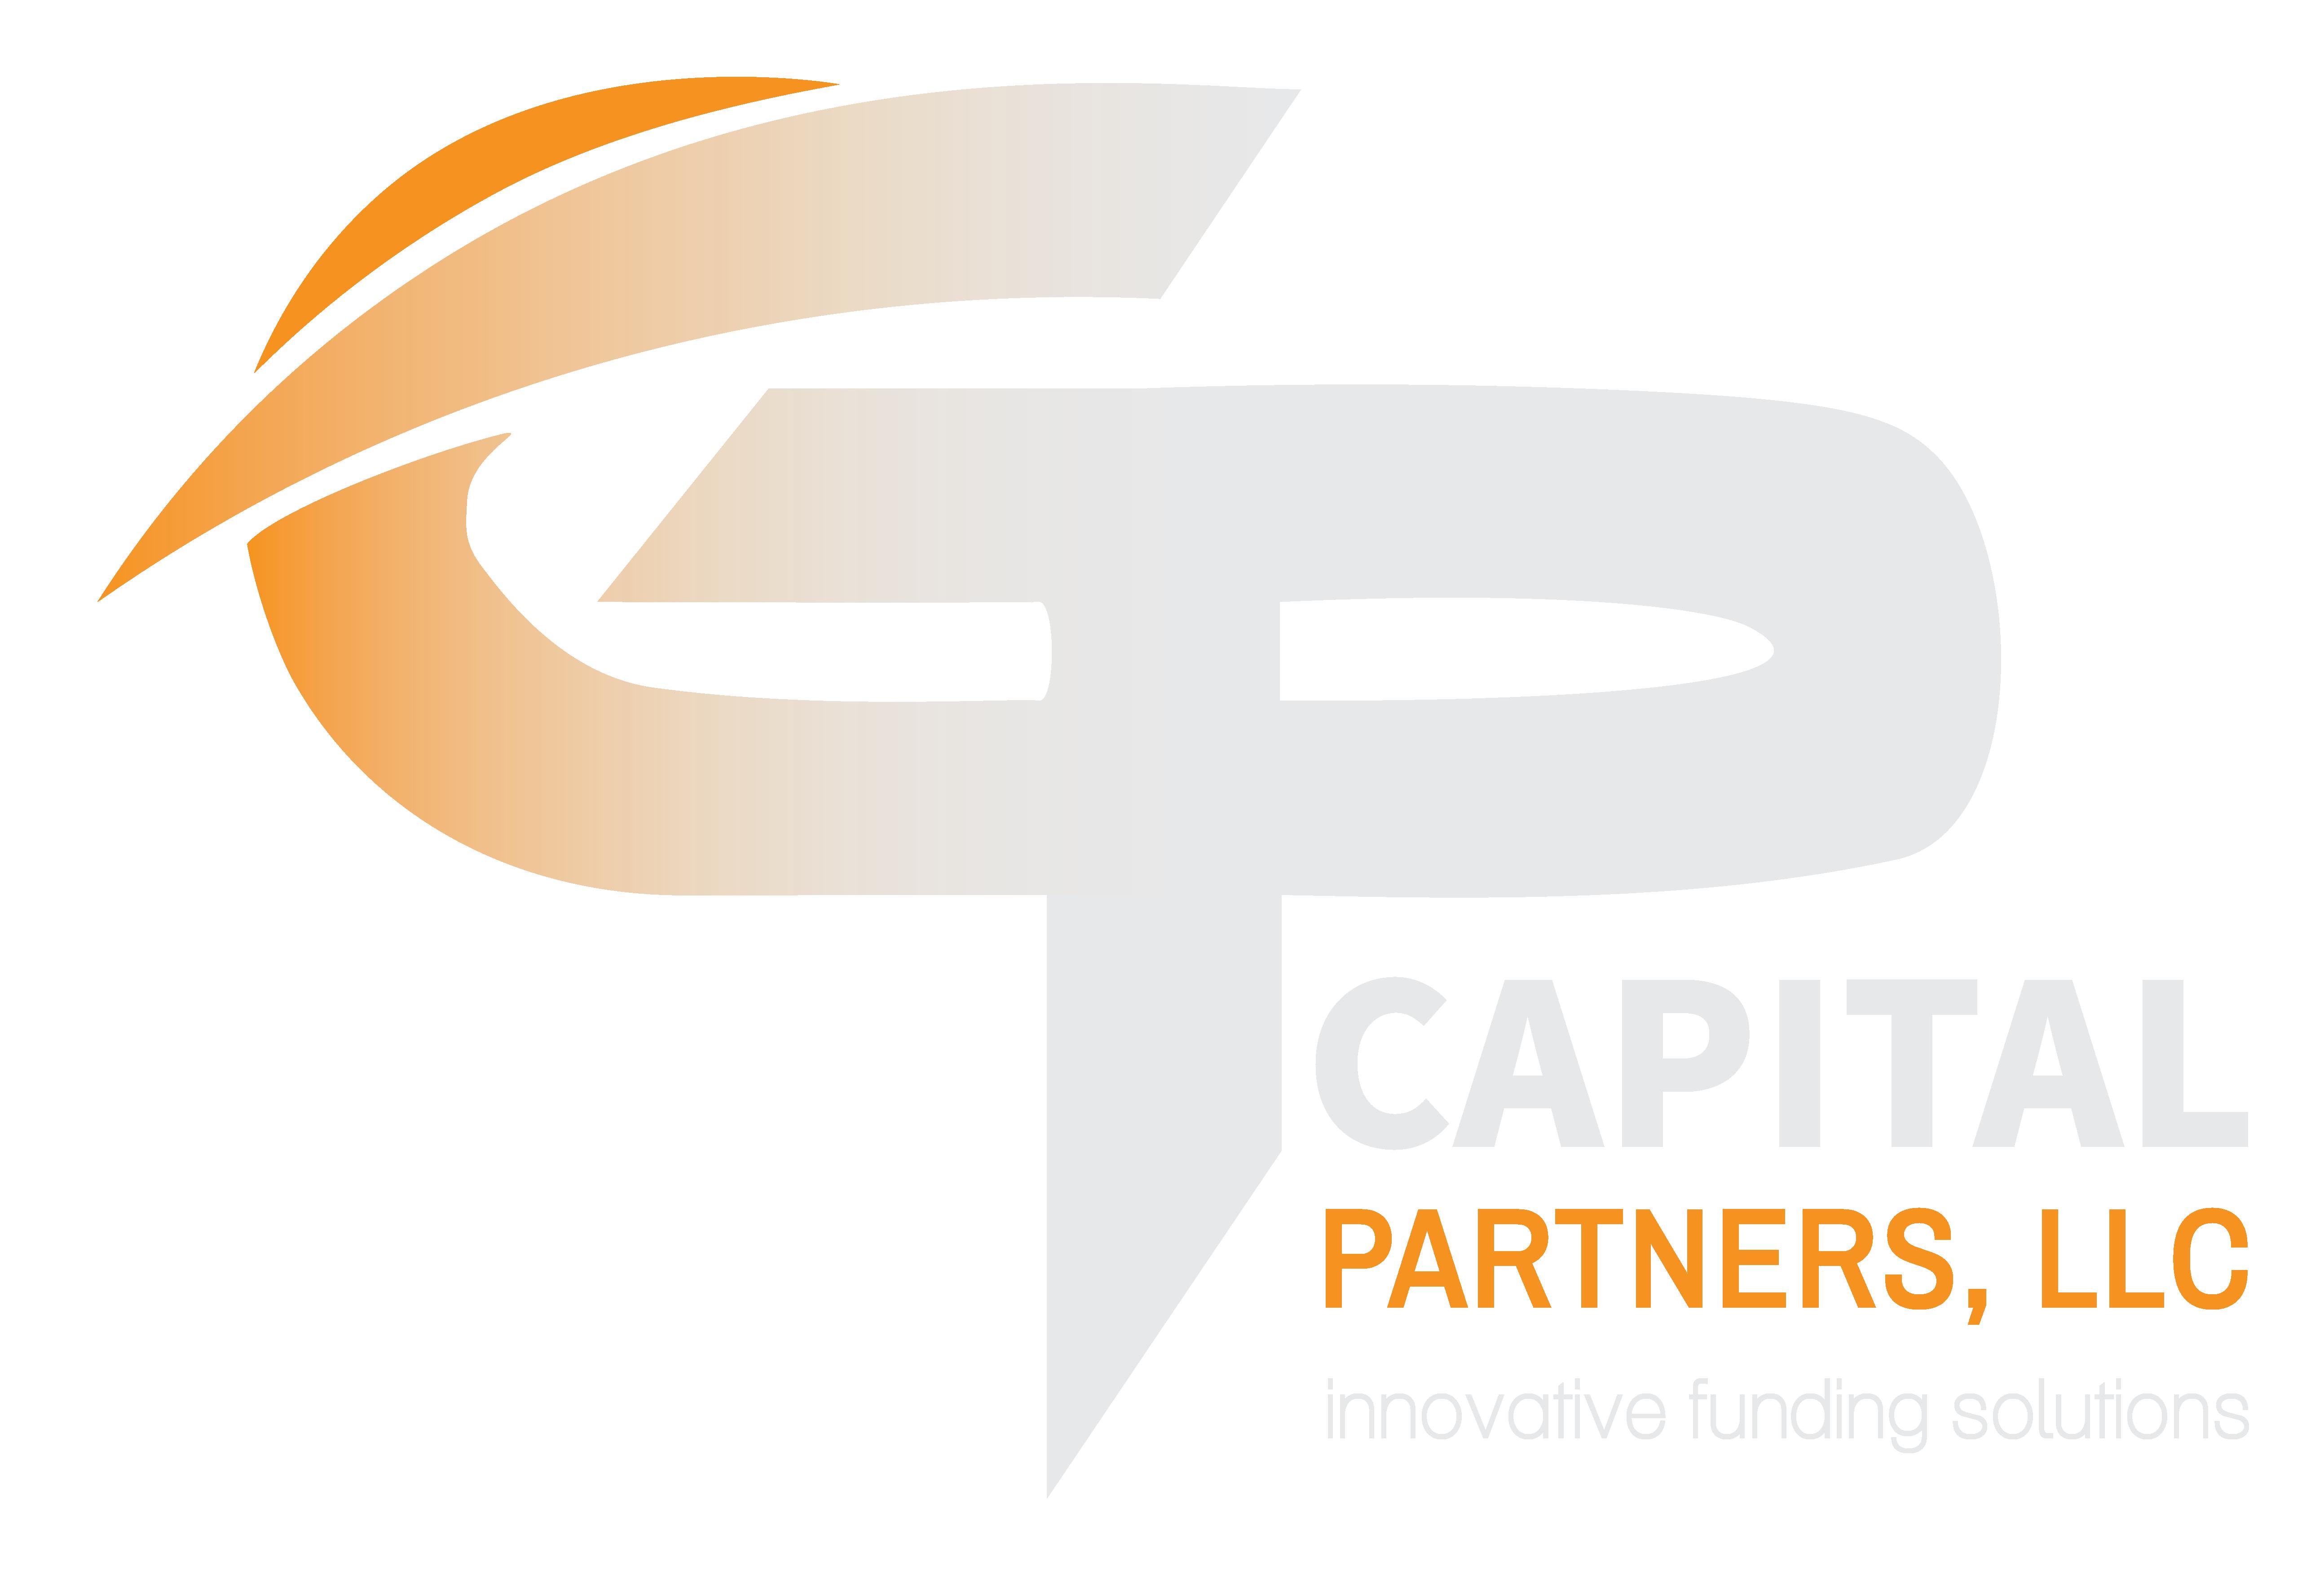 G.P. Capital Partners - Sheridan, WY